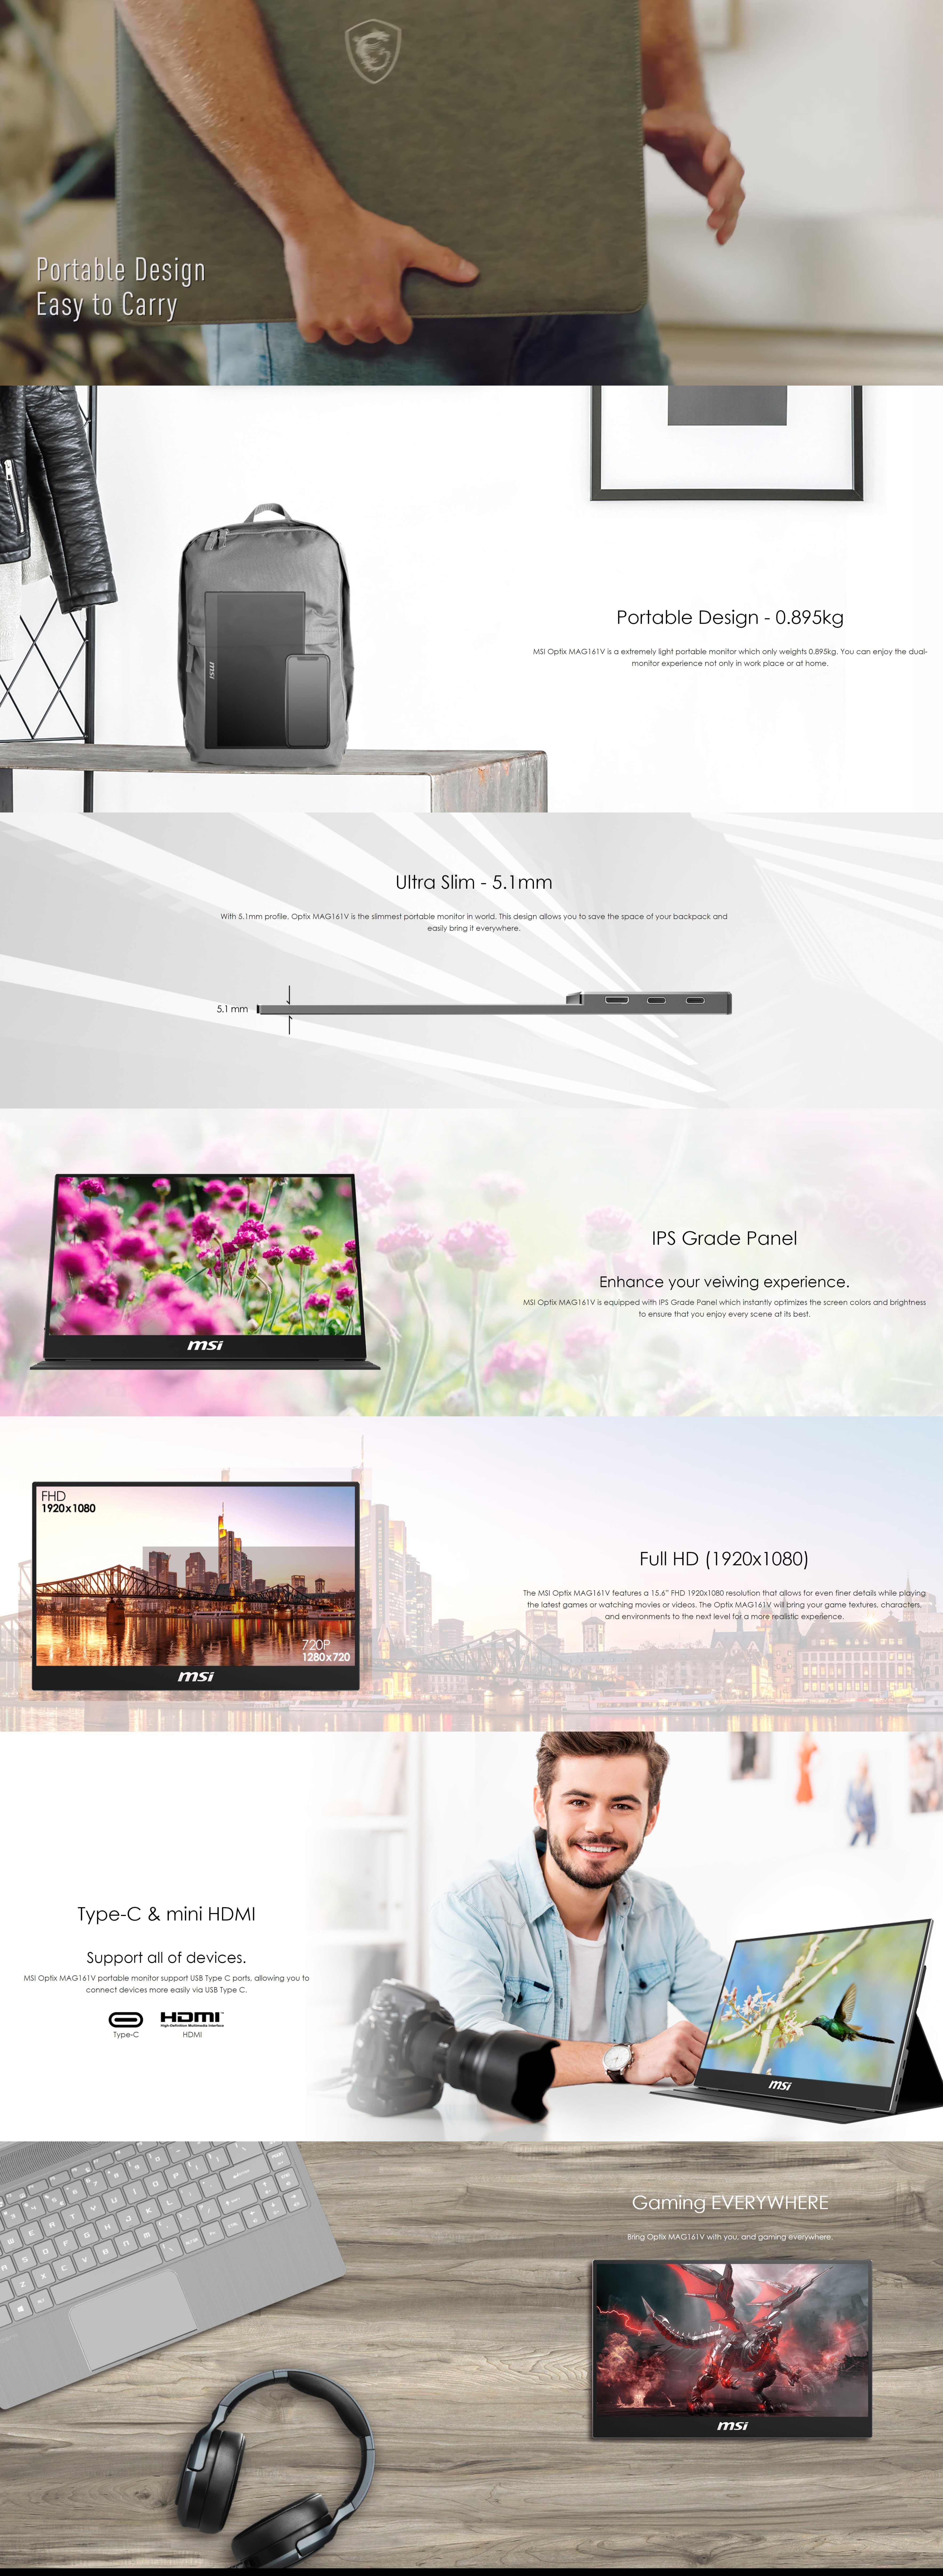 screencapture-msi-Monitor-Optix-MAG161V-Overview-2020-05-01-11_44_59.jpg